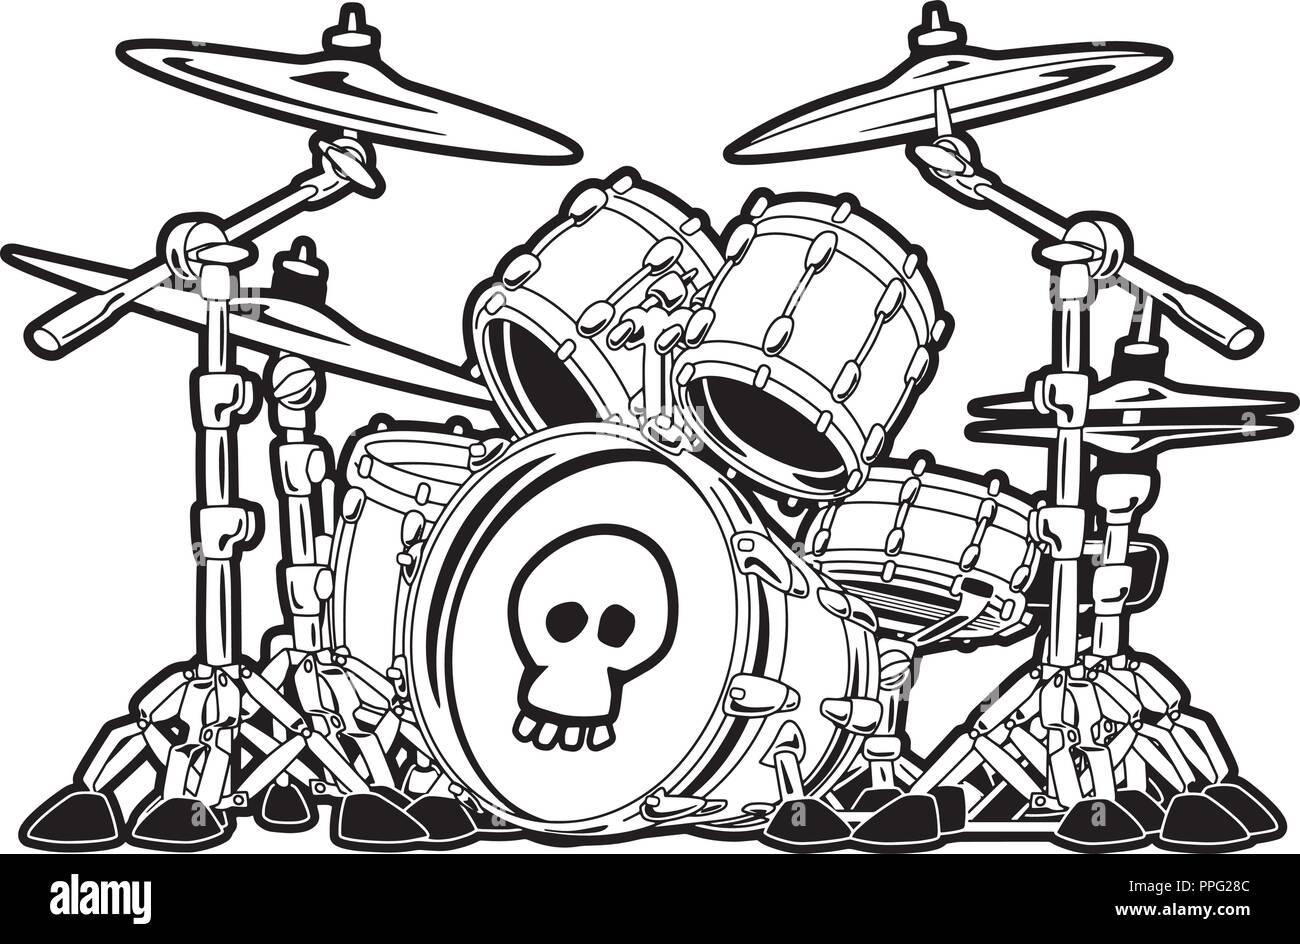 Rock Drum Set Cartoon Vector Illustration Vektor Abbildung Bild